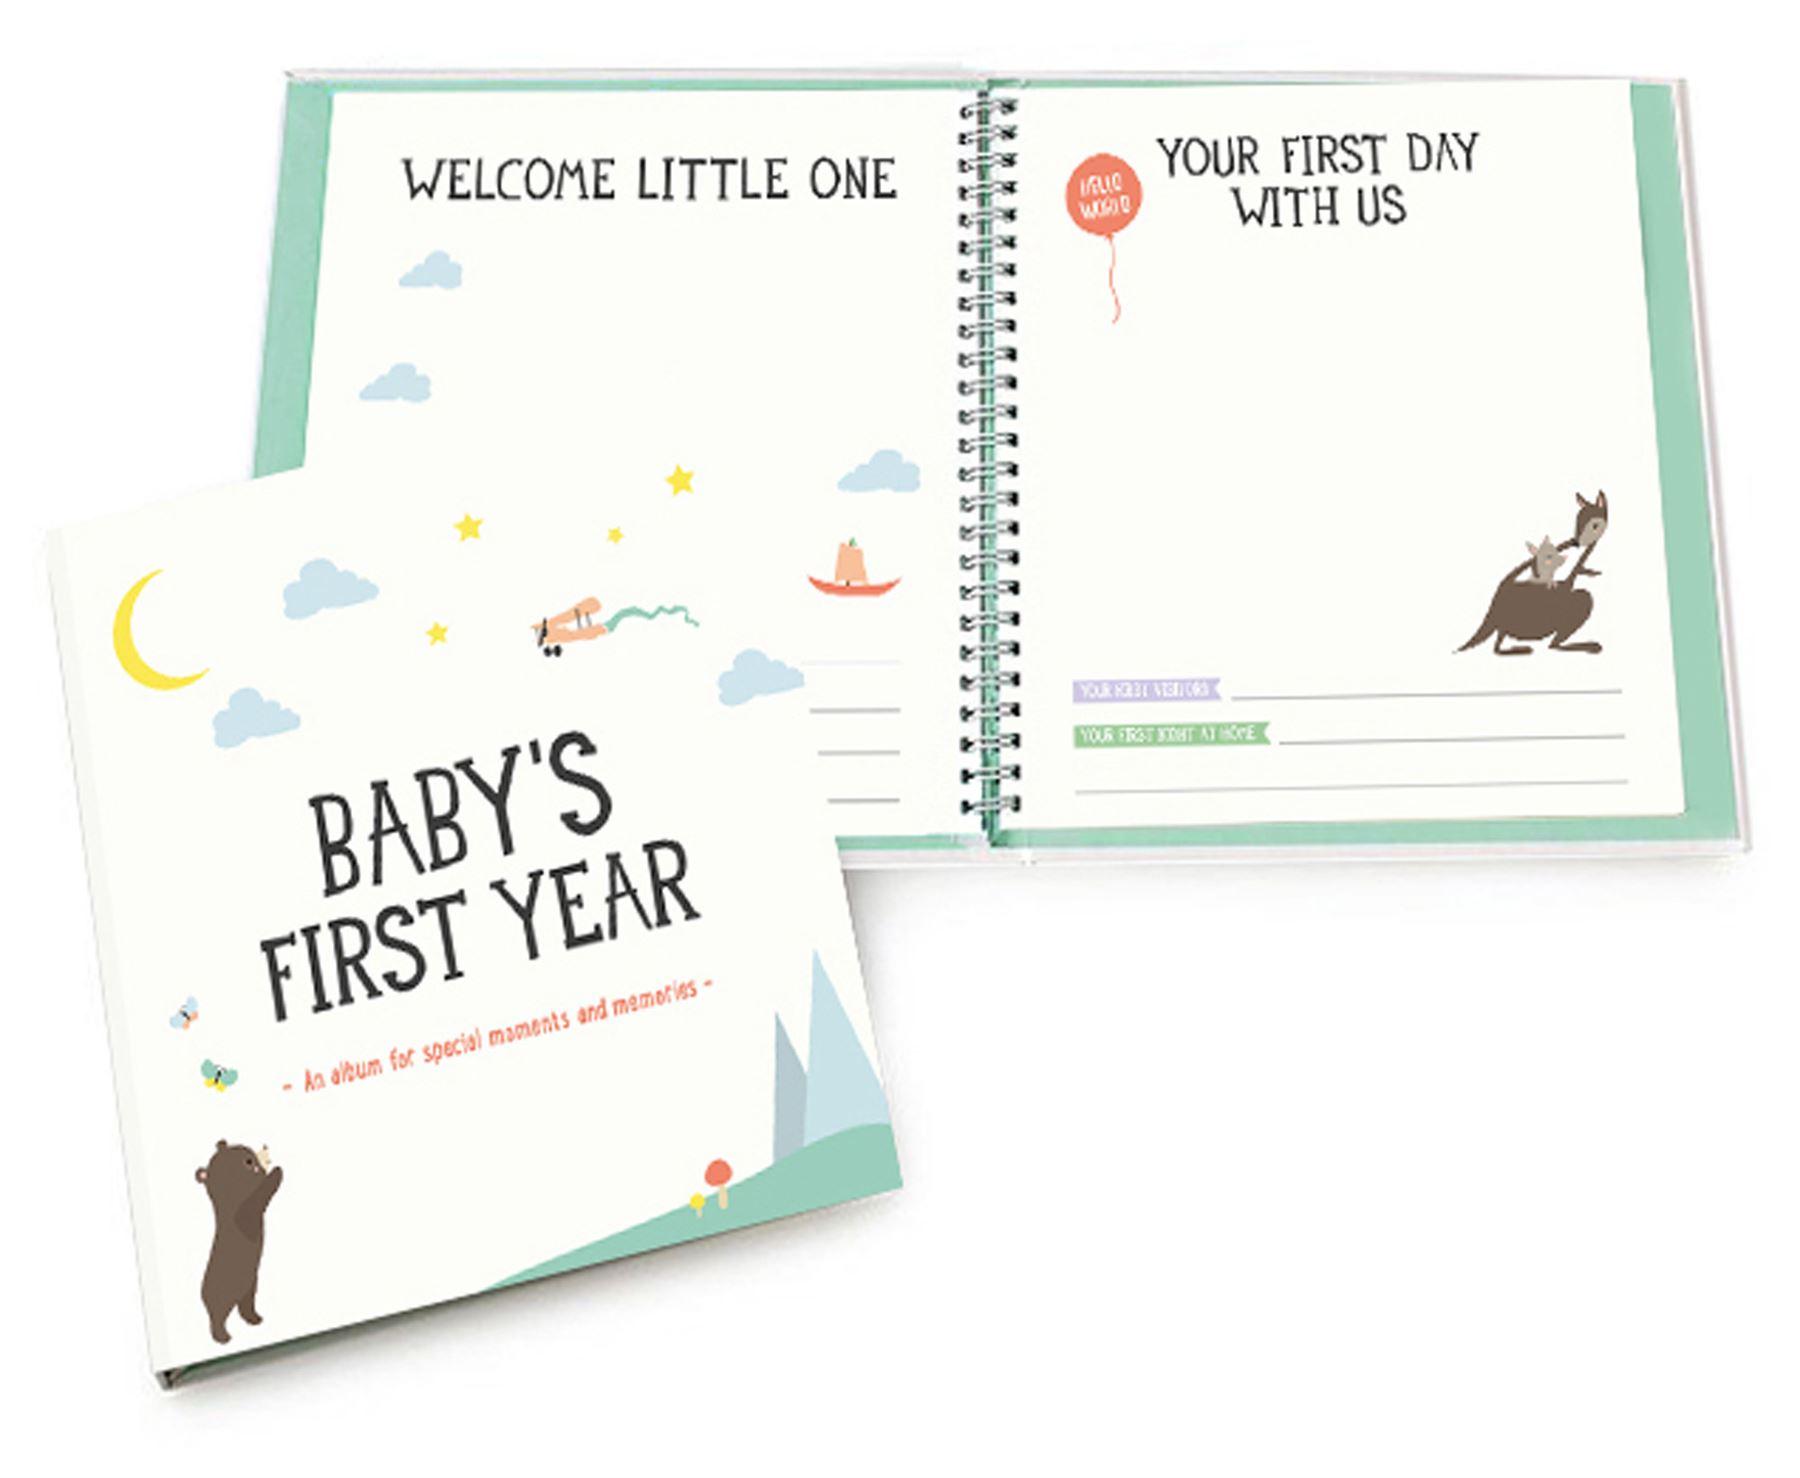 Milestone Babys Erster Special Moments Fotoalben & -boxen Urlaub Baby Neu